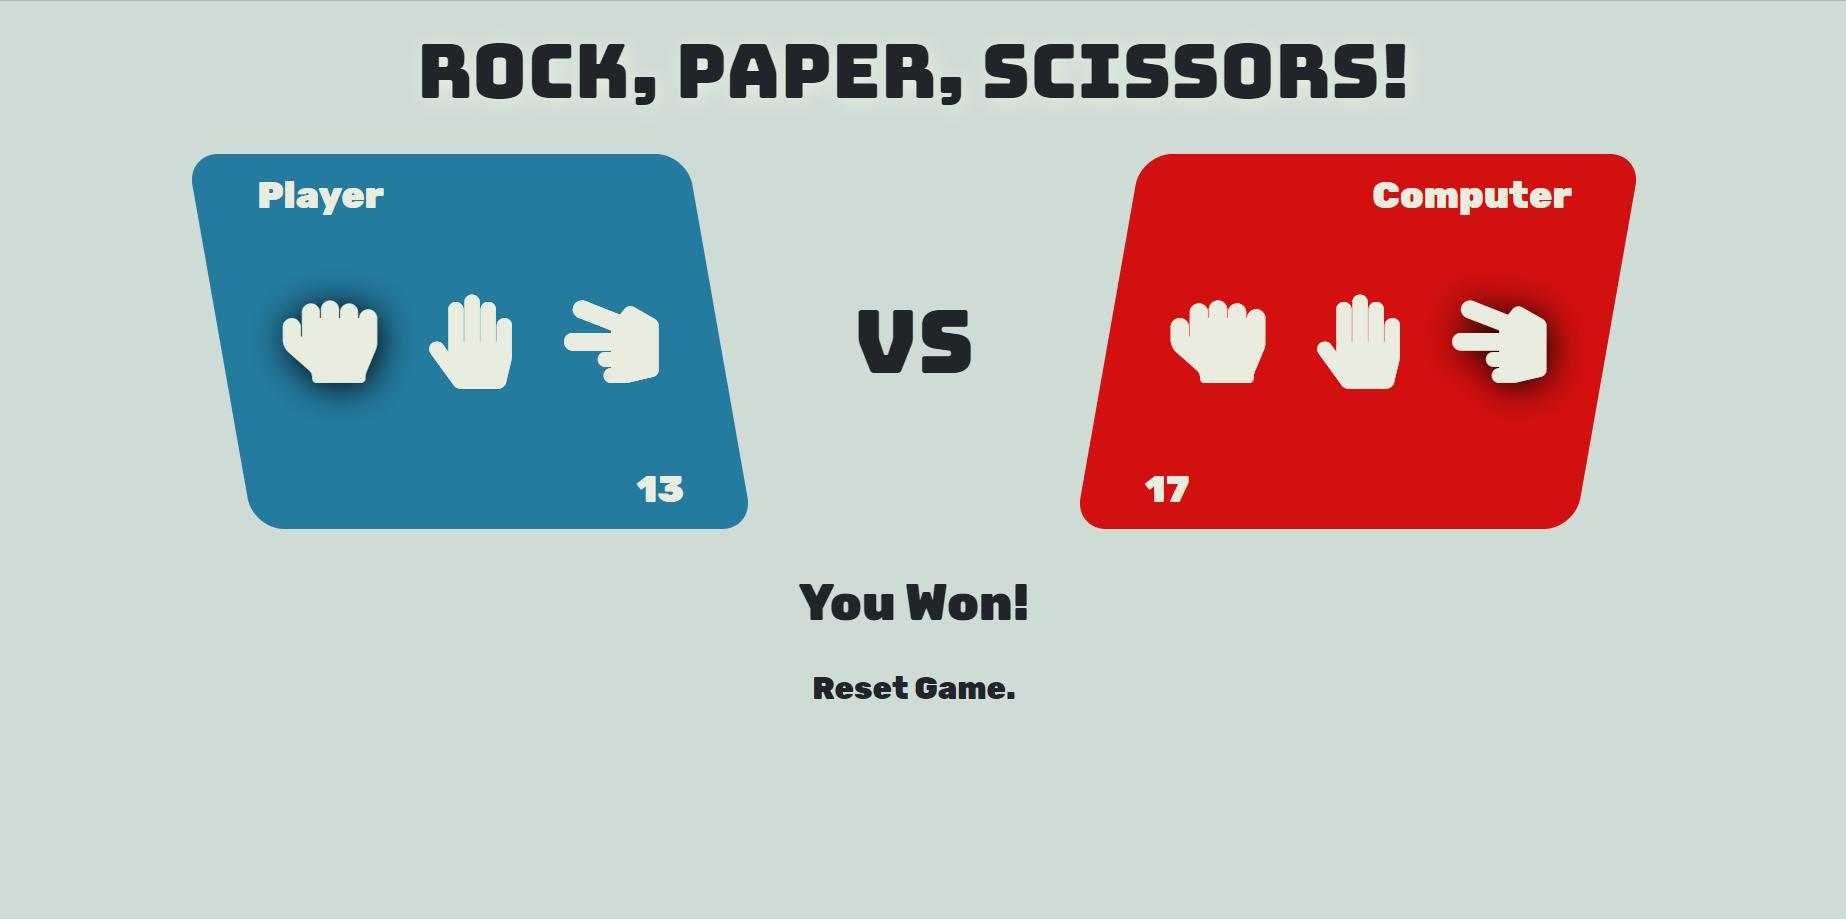 image of Rock Paper Scissor